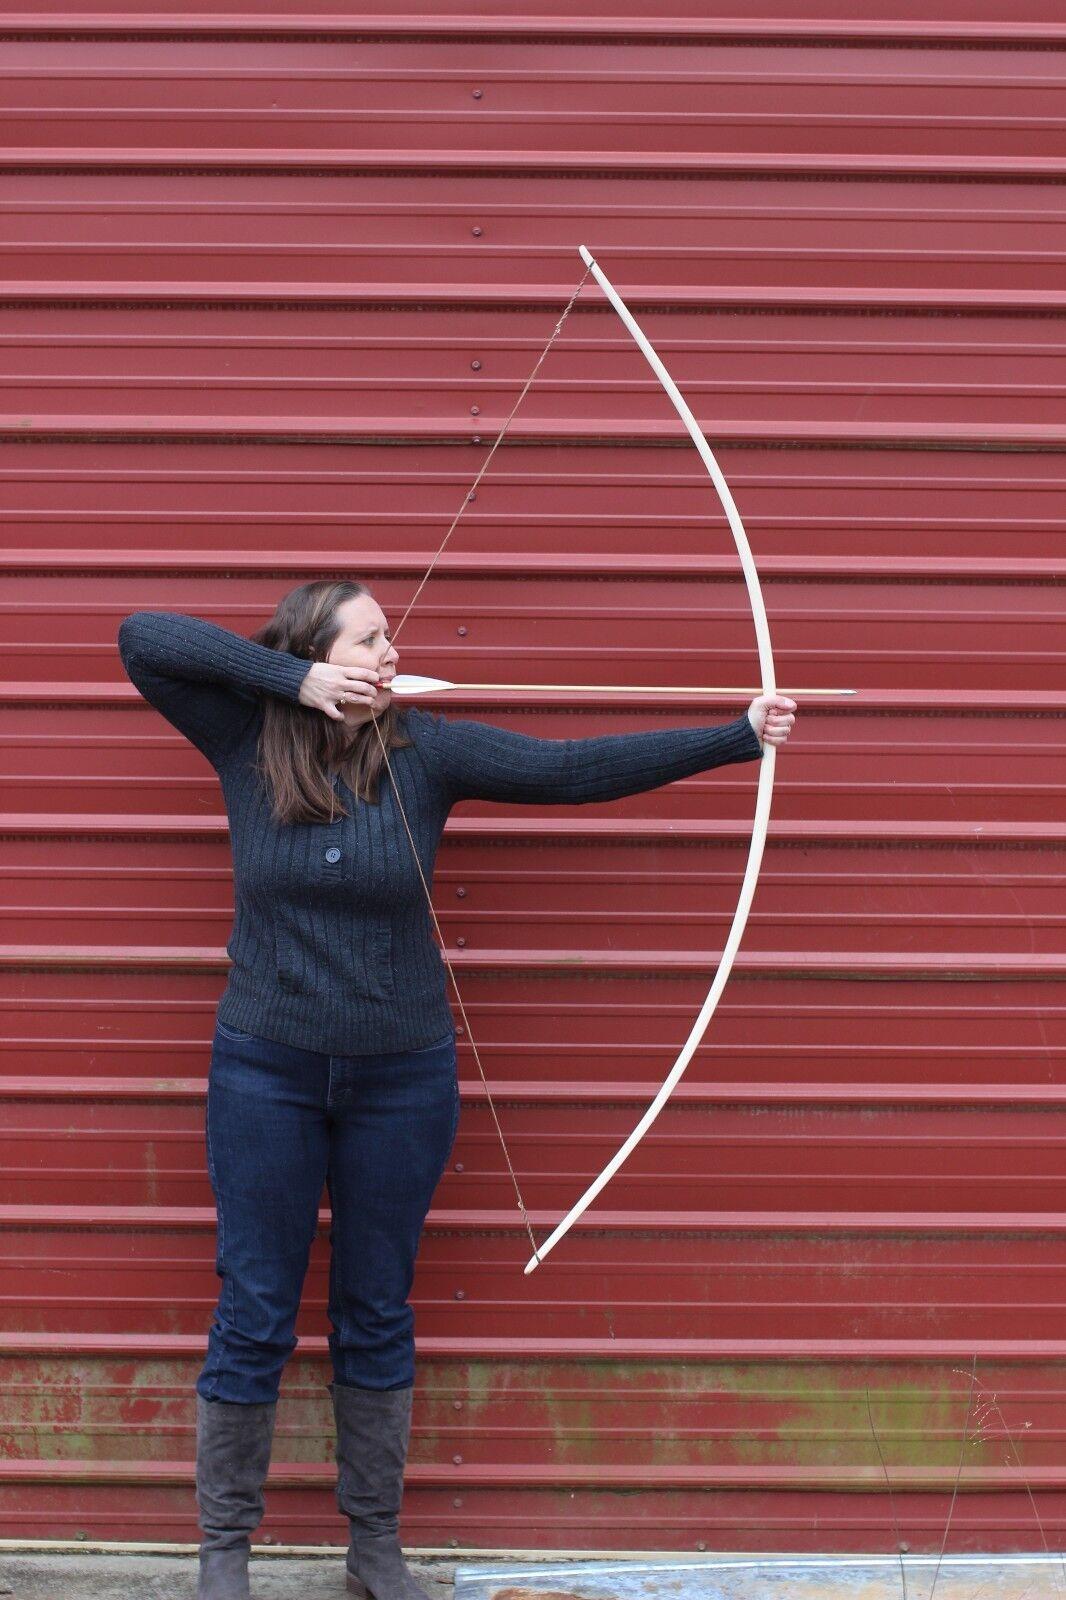 Hecho a mano estilo inglés tradicional Longbow Hecha De Hickory 40lbs @ 28